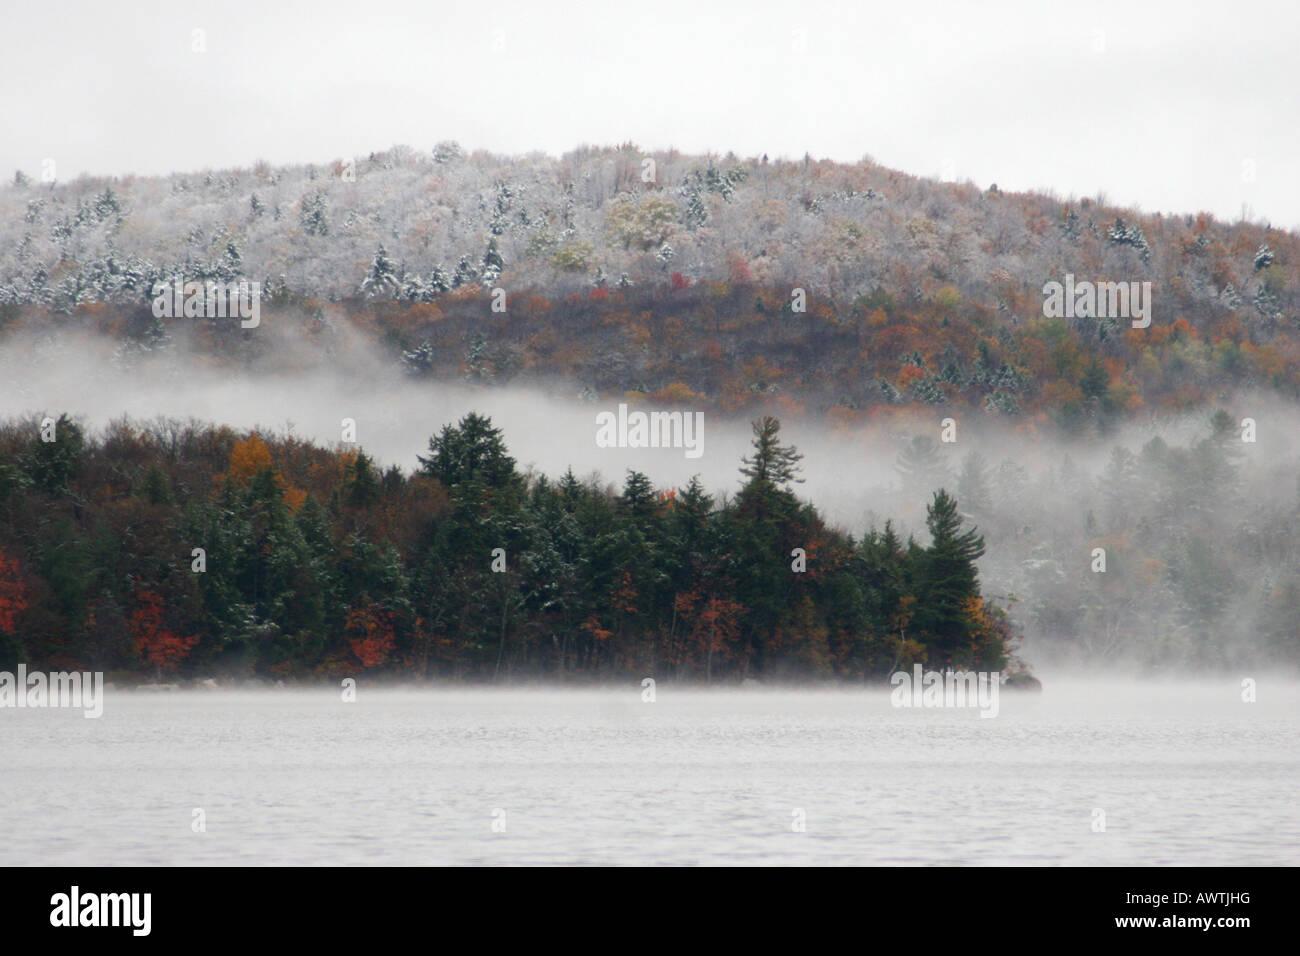 Changing seasons on Sacandaga Lake, Adirondack Mountains, New York, United States - Stock Image